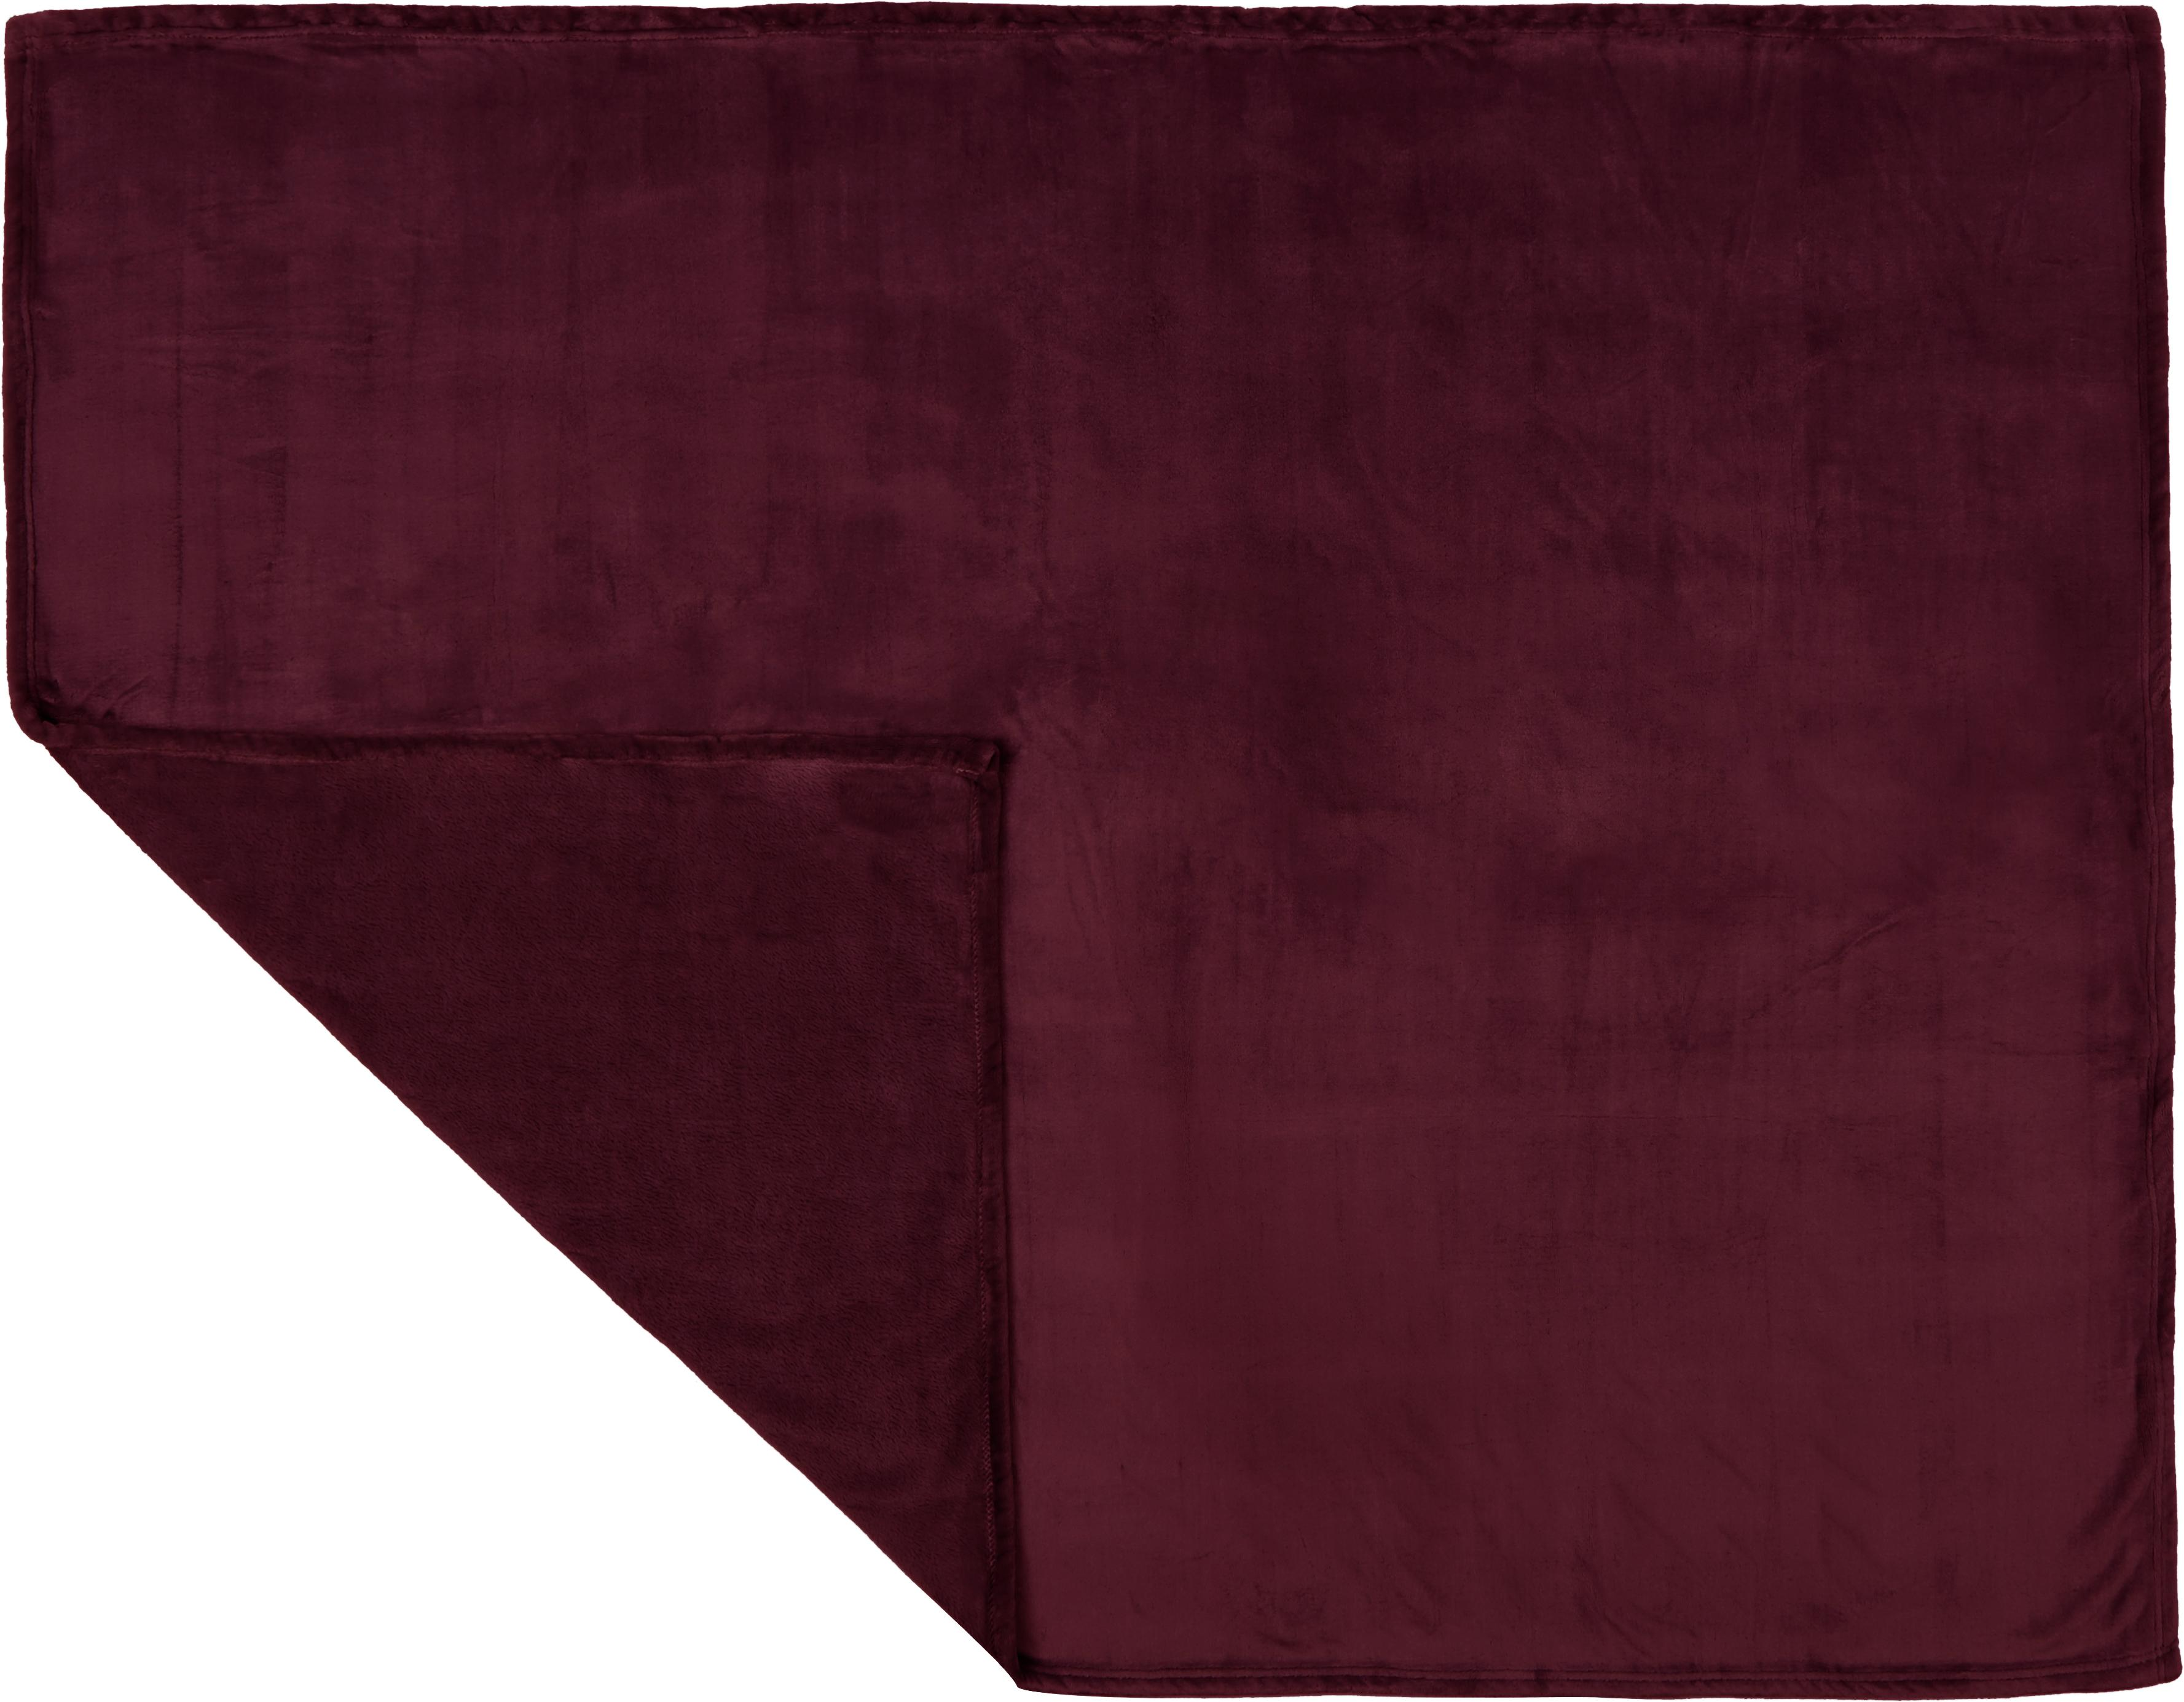 Plaid in morbido pile rosso vino Doudou, 100% poliestere, Vino rosso, Larg. 130 x Lung. 160 cm